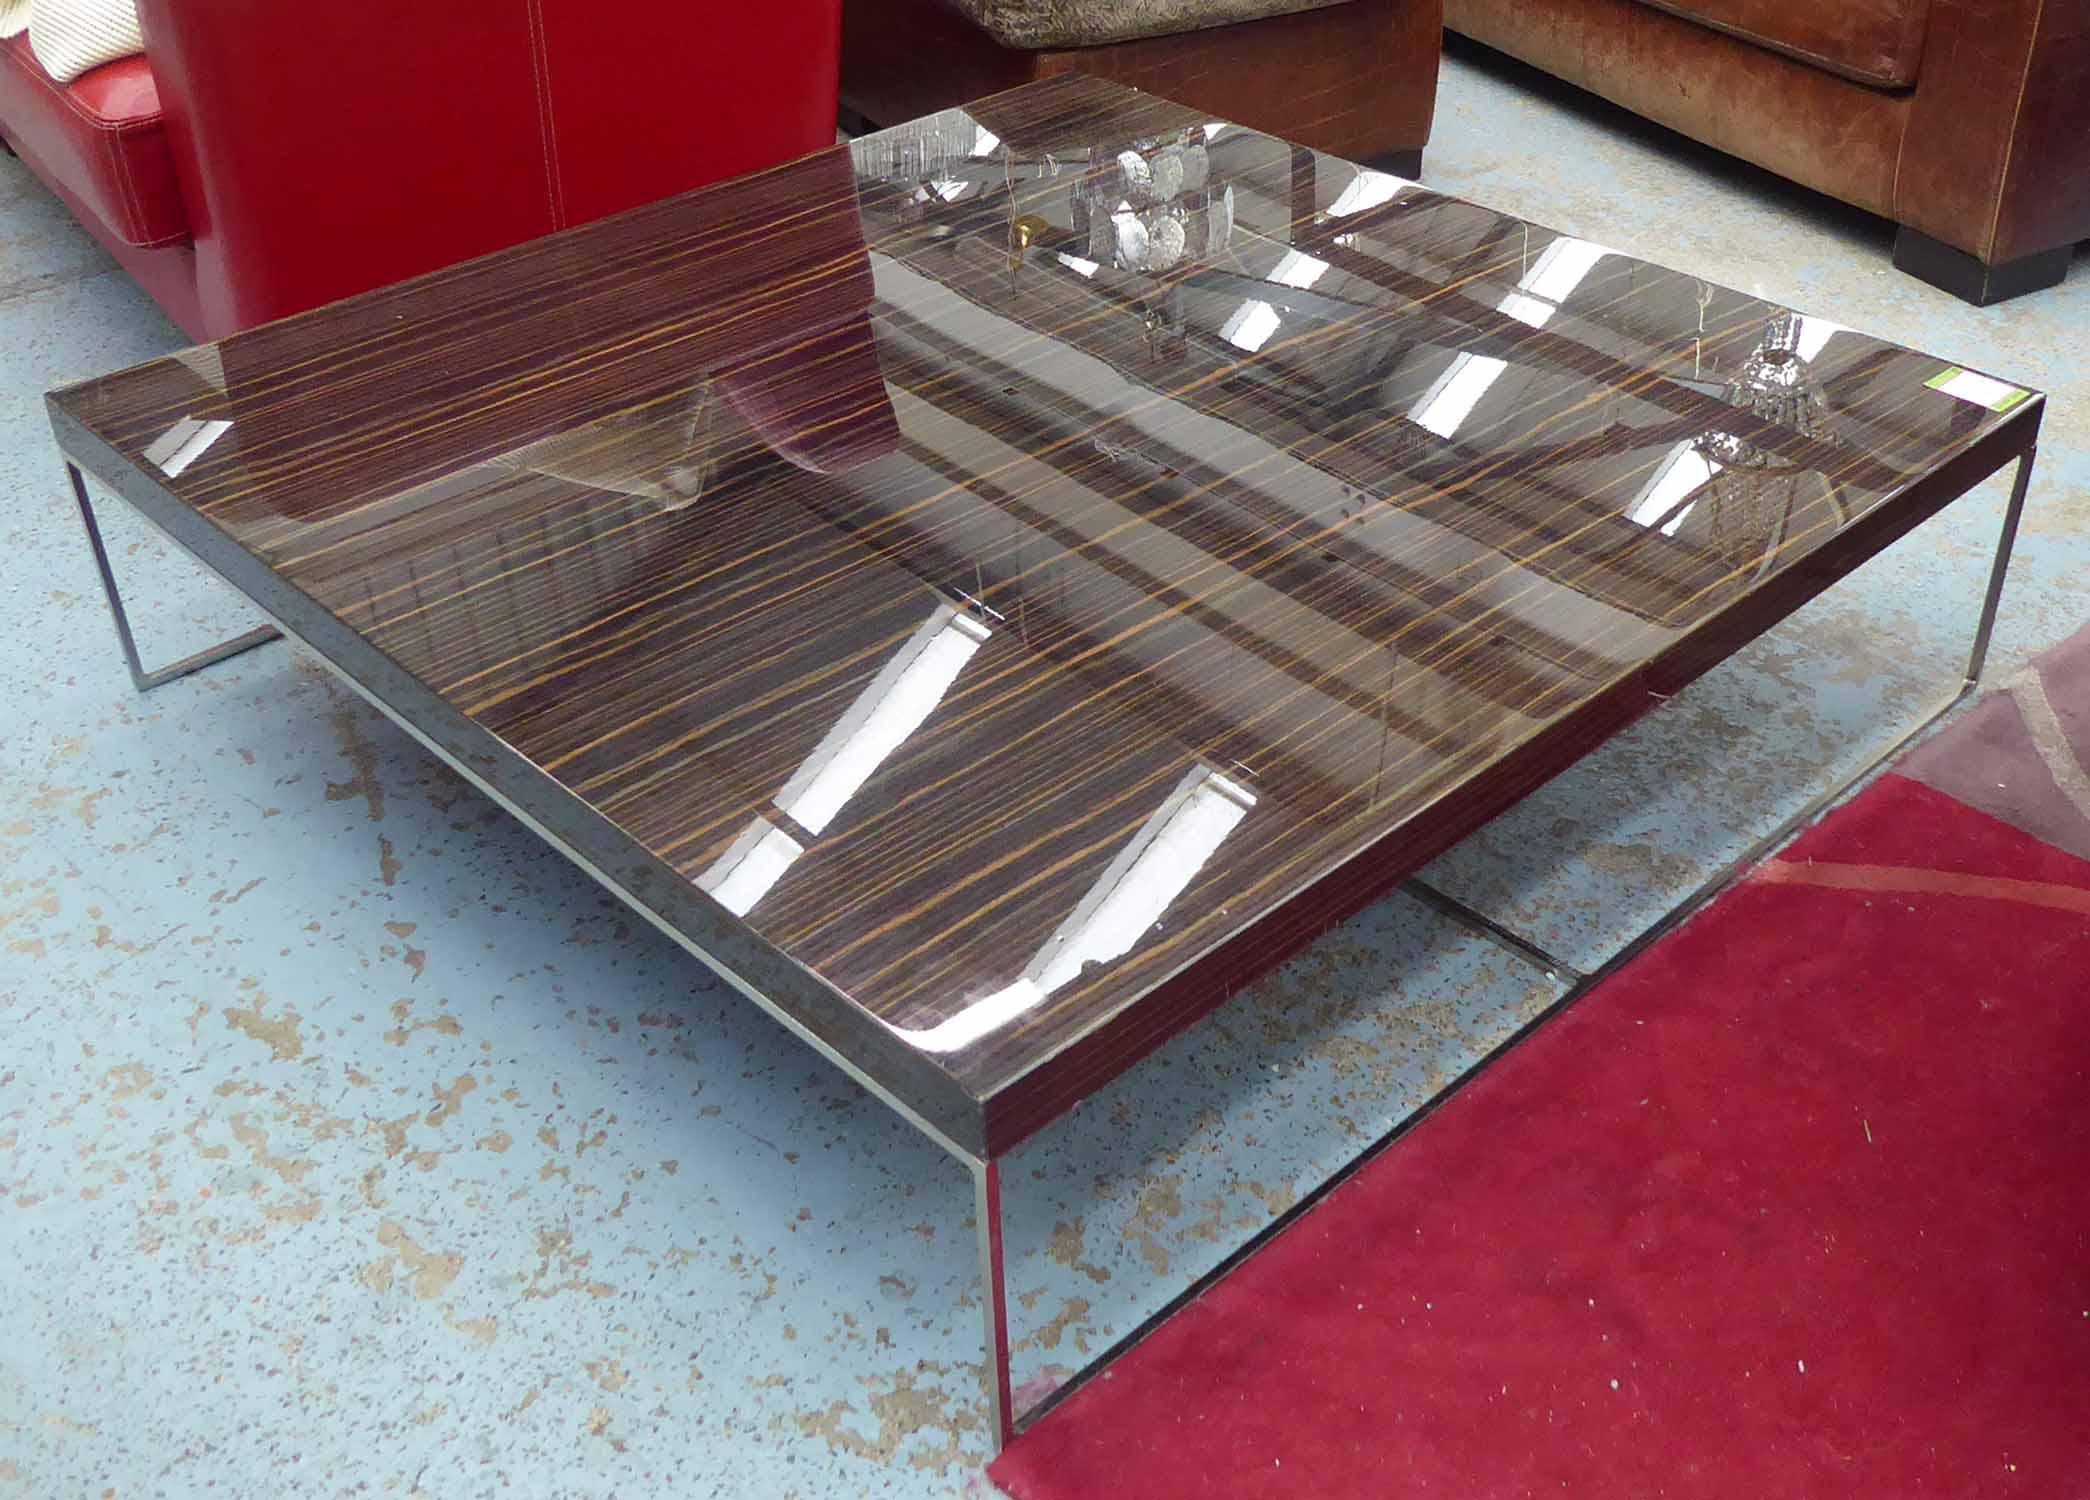 Lot 51 - MINOTTI CALDER LOW TABLE BY RODOLFO DORDONI, 120cm x 120cm x 30cm.